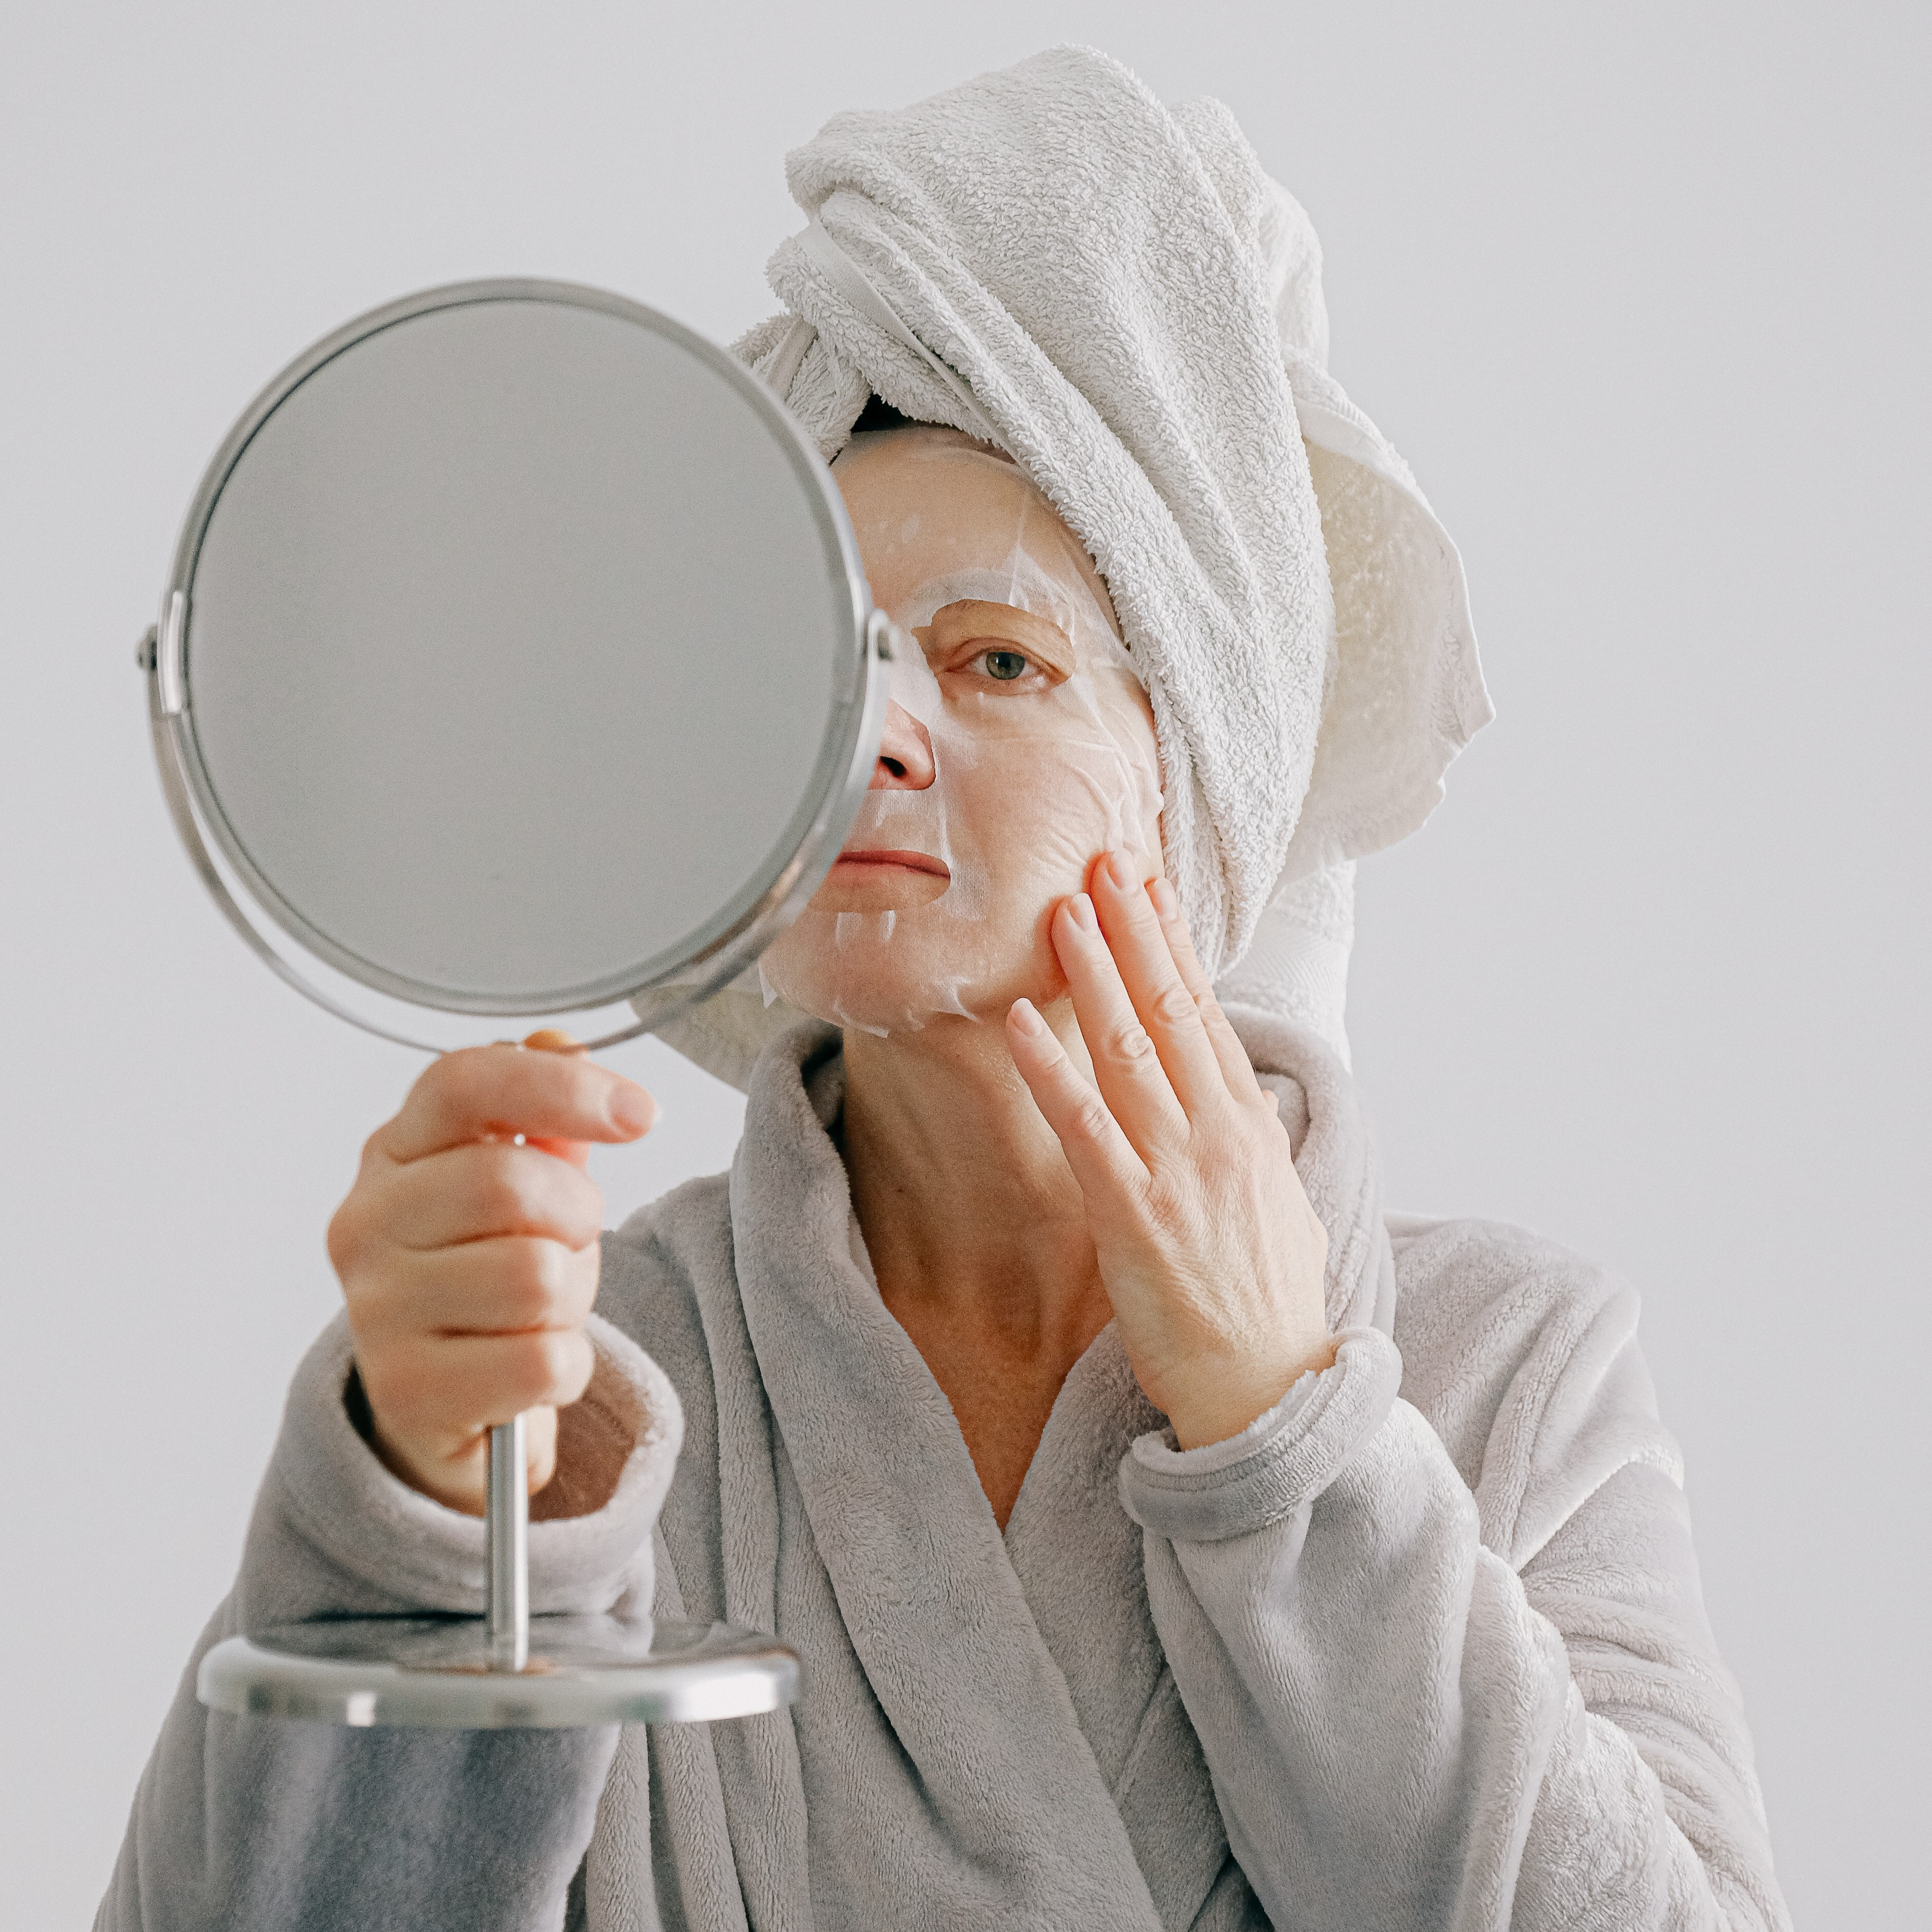 person-in-gray-bathrobe-holding-round-mirror-3846099